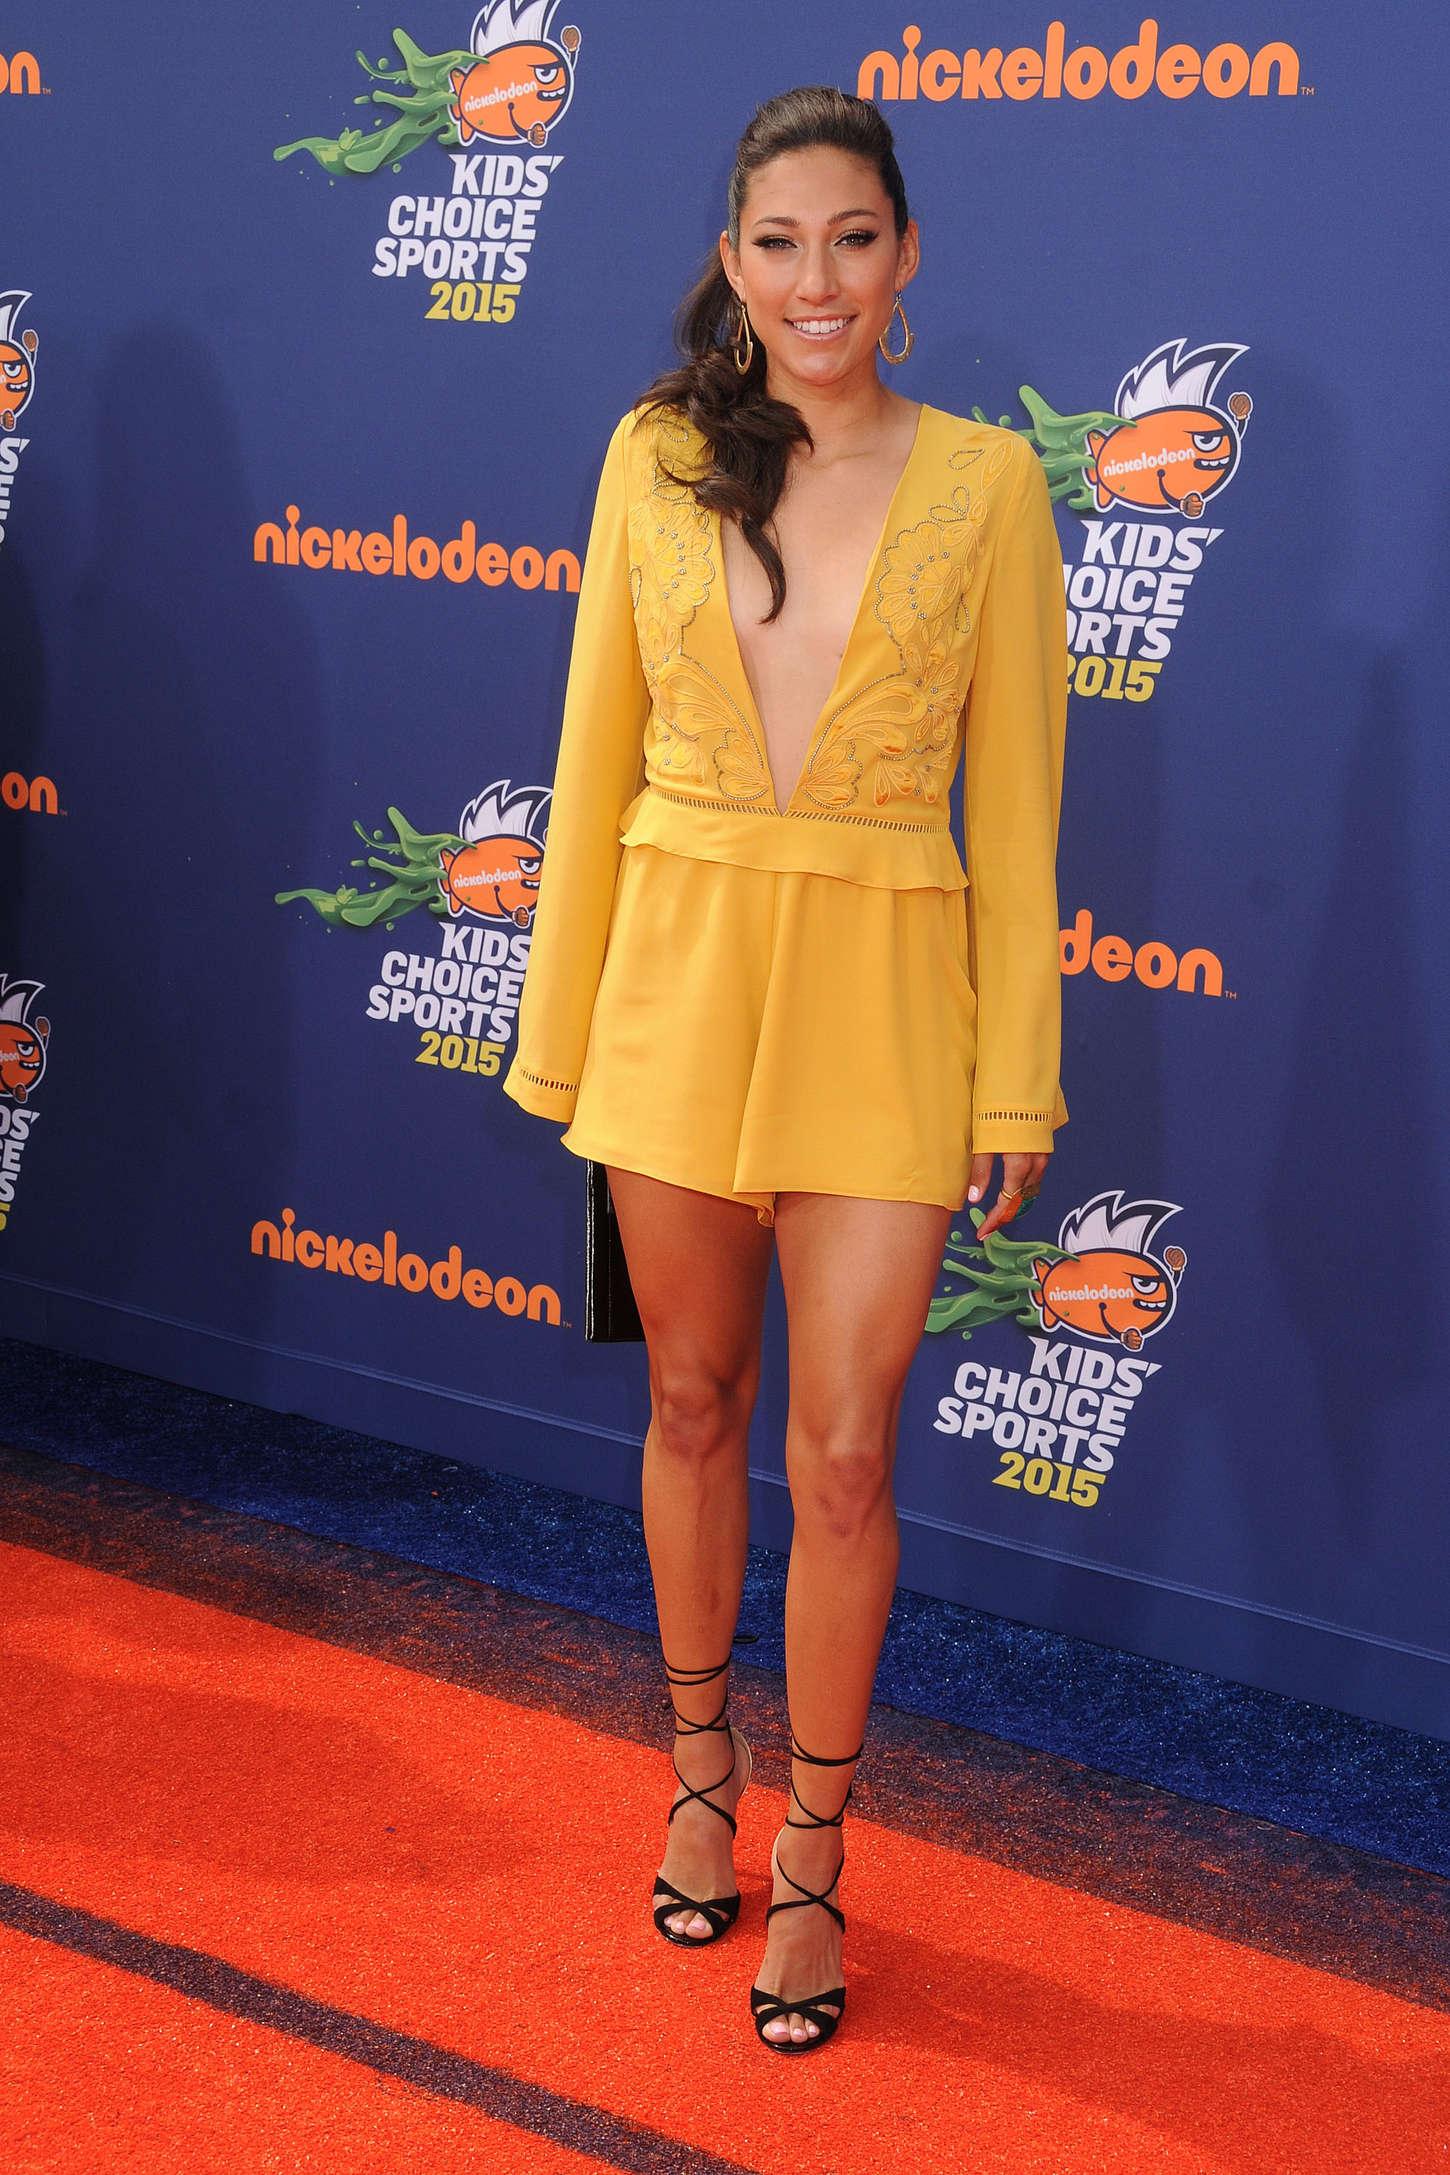 Christen Press - 2015 Nickelodeon's Kids' Choice Sports ... Vanessa Hudgens Dating